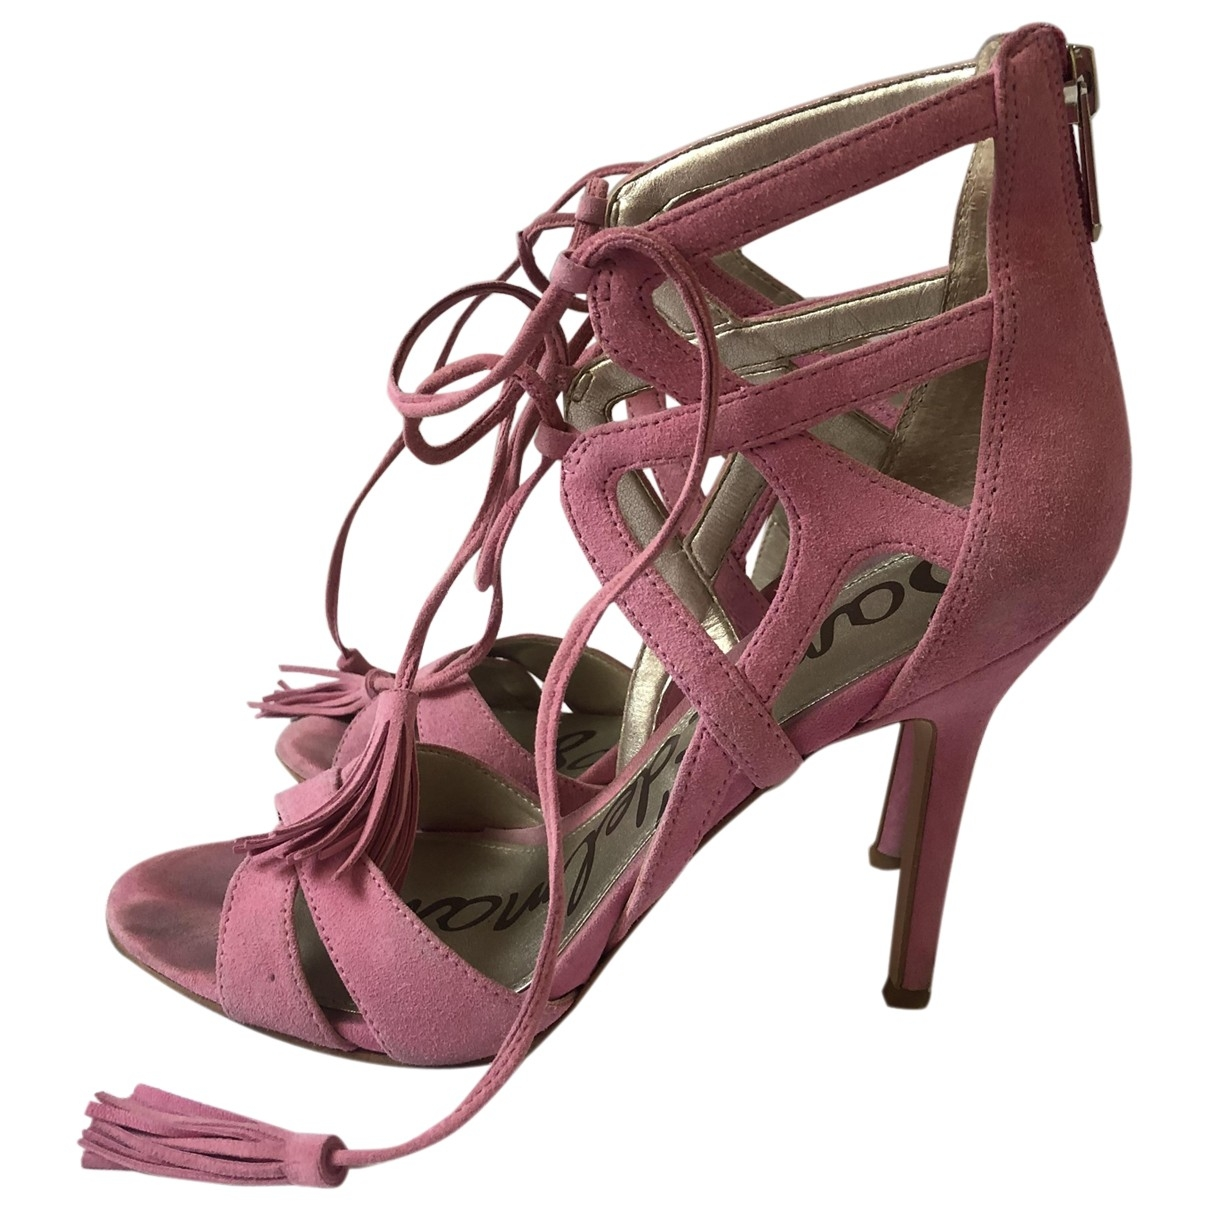 Sam Edelman \N Pink Suede Sandals for Women 7.5 US